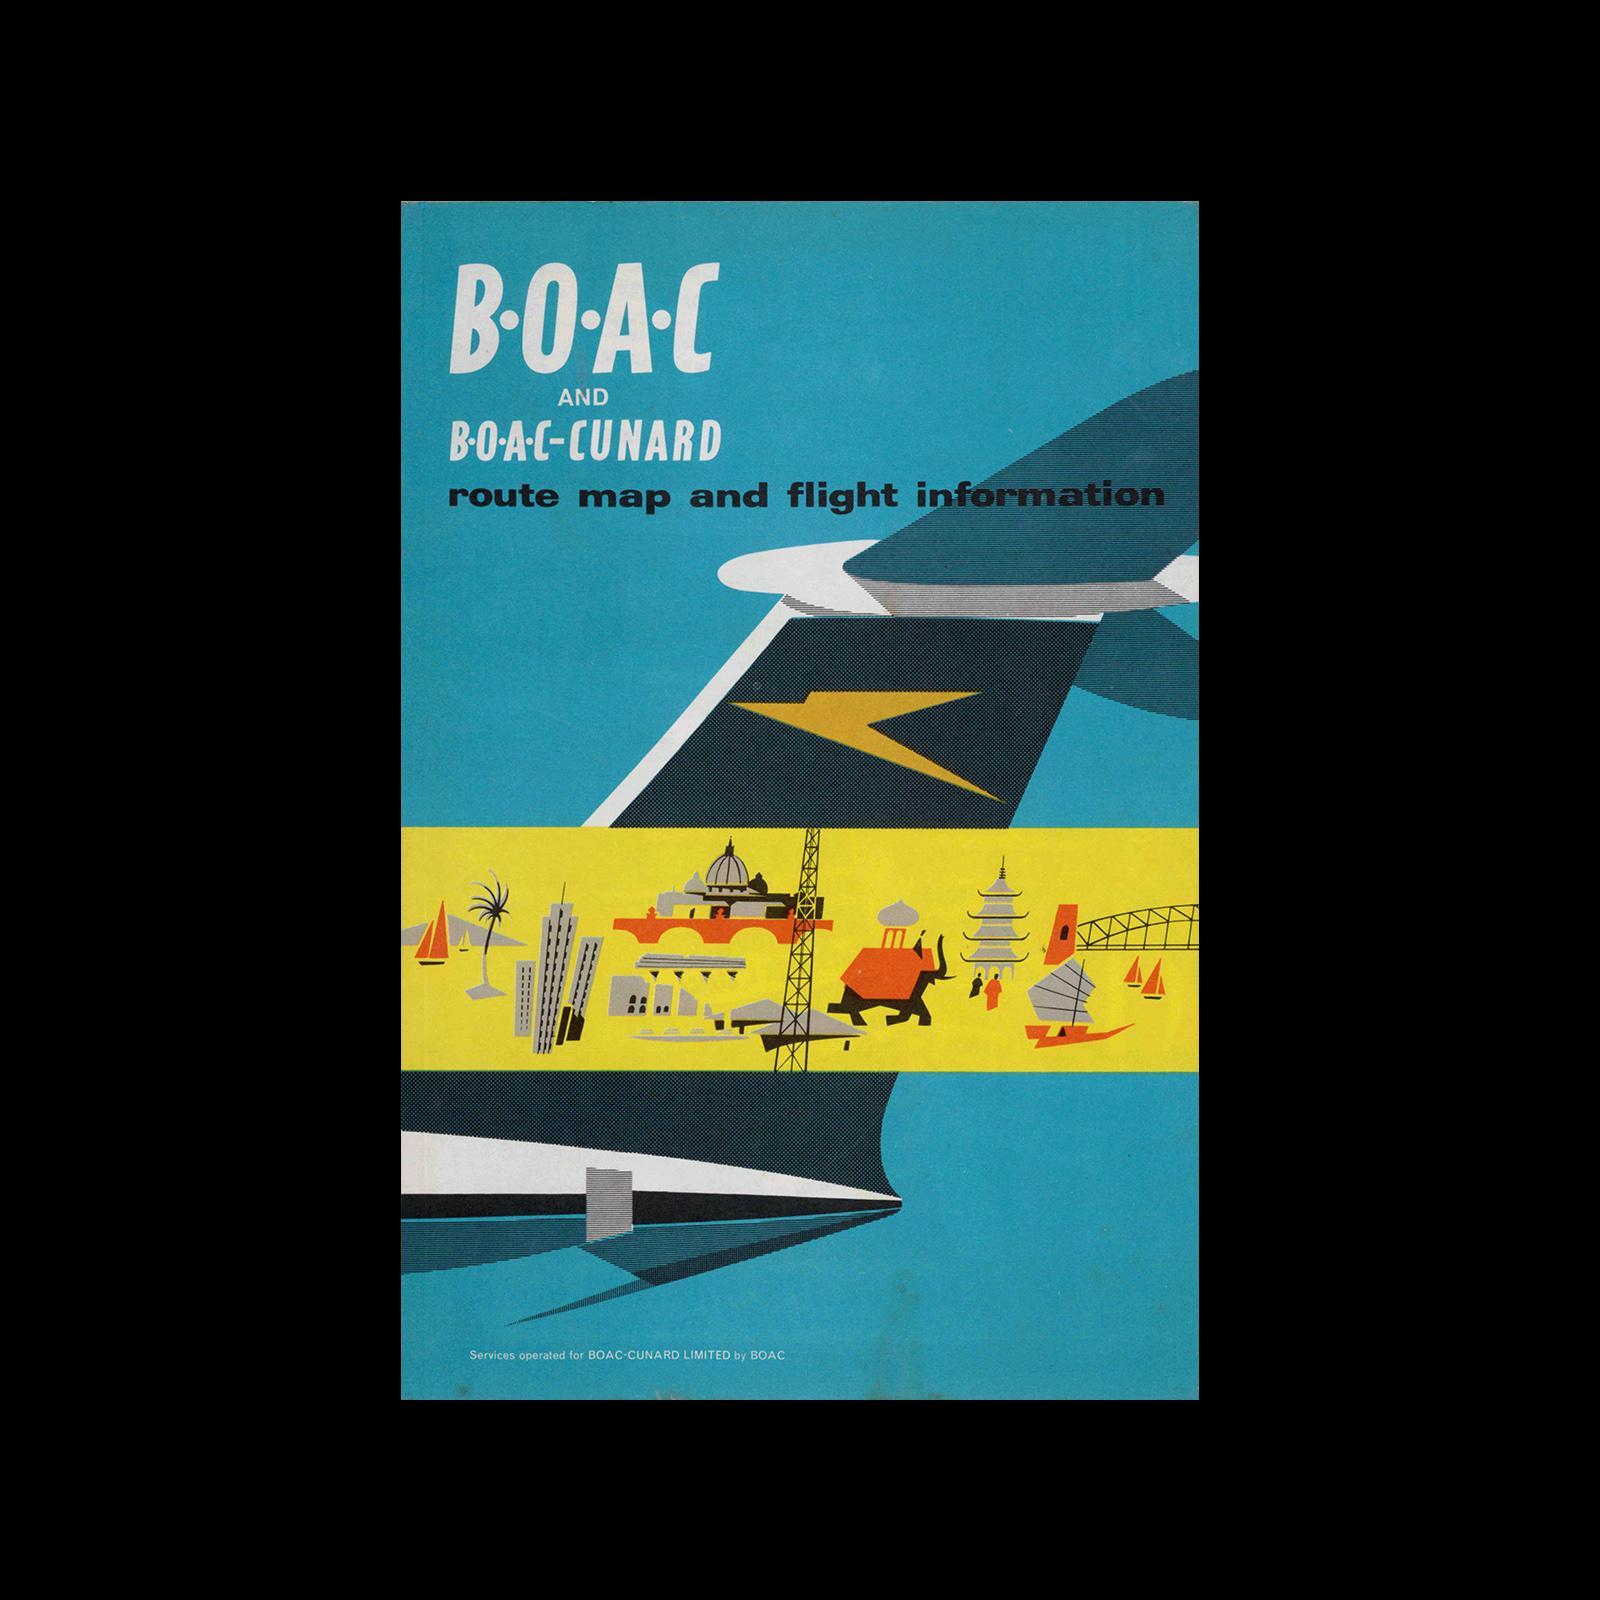 BOAC & B.O.A.C-Cunard, Route Map & Flight Information, 1964